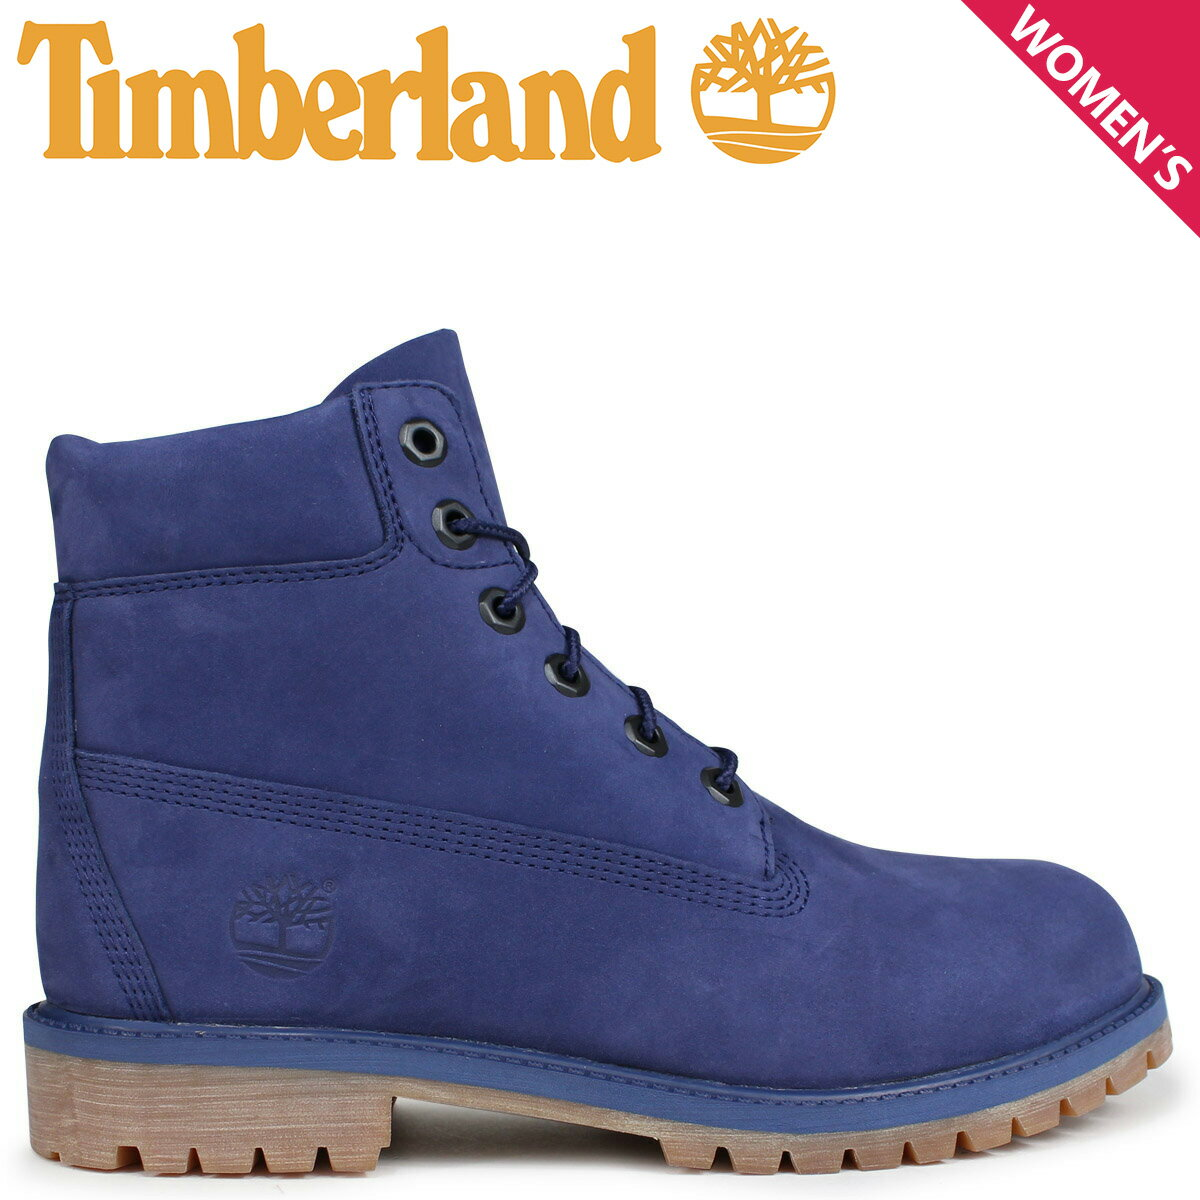 Timberland レディース ブーツ 6インチ ティンバーランド キッズ JUNIOR 6INCHI PREMIUM WATERPROOF BOOT A1VCV Wワイズ 防水 ブルー